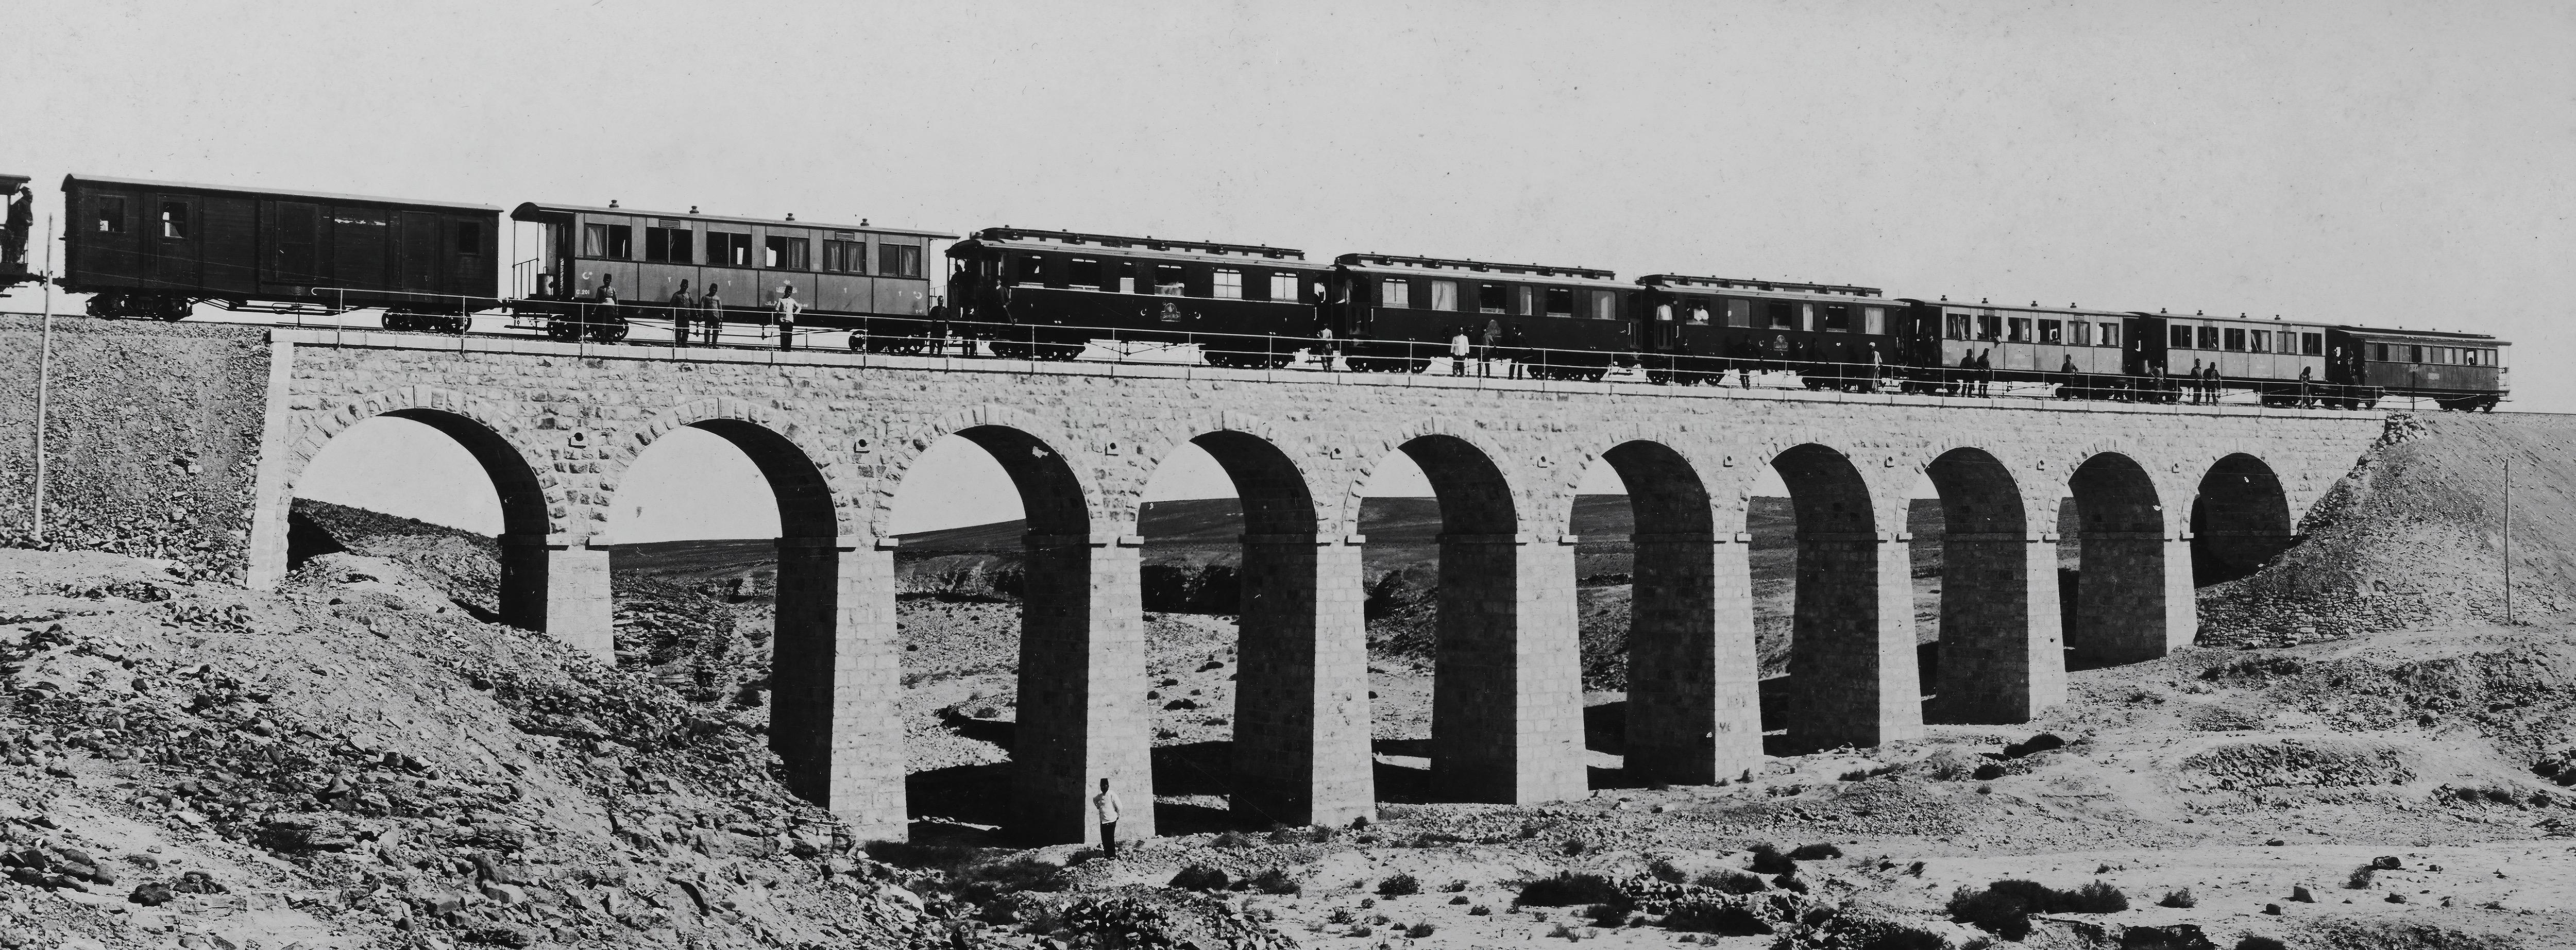 Album with 50 photographs of the Hijaz railway